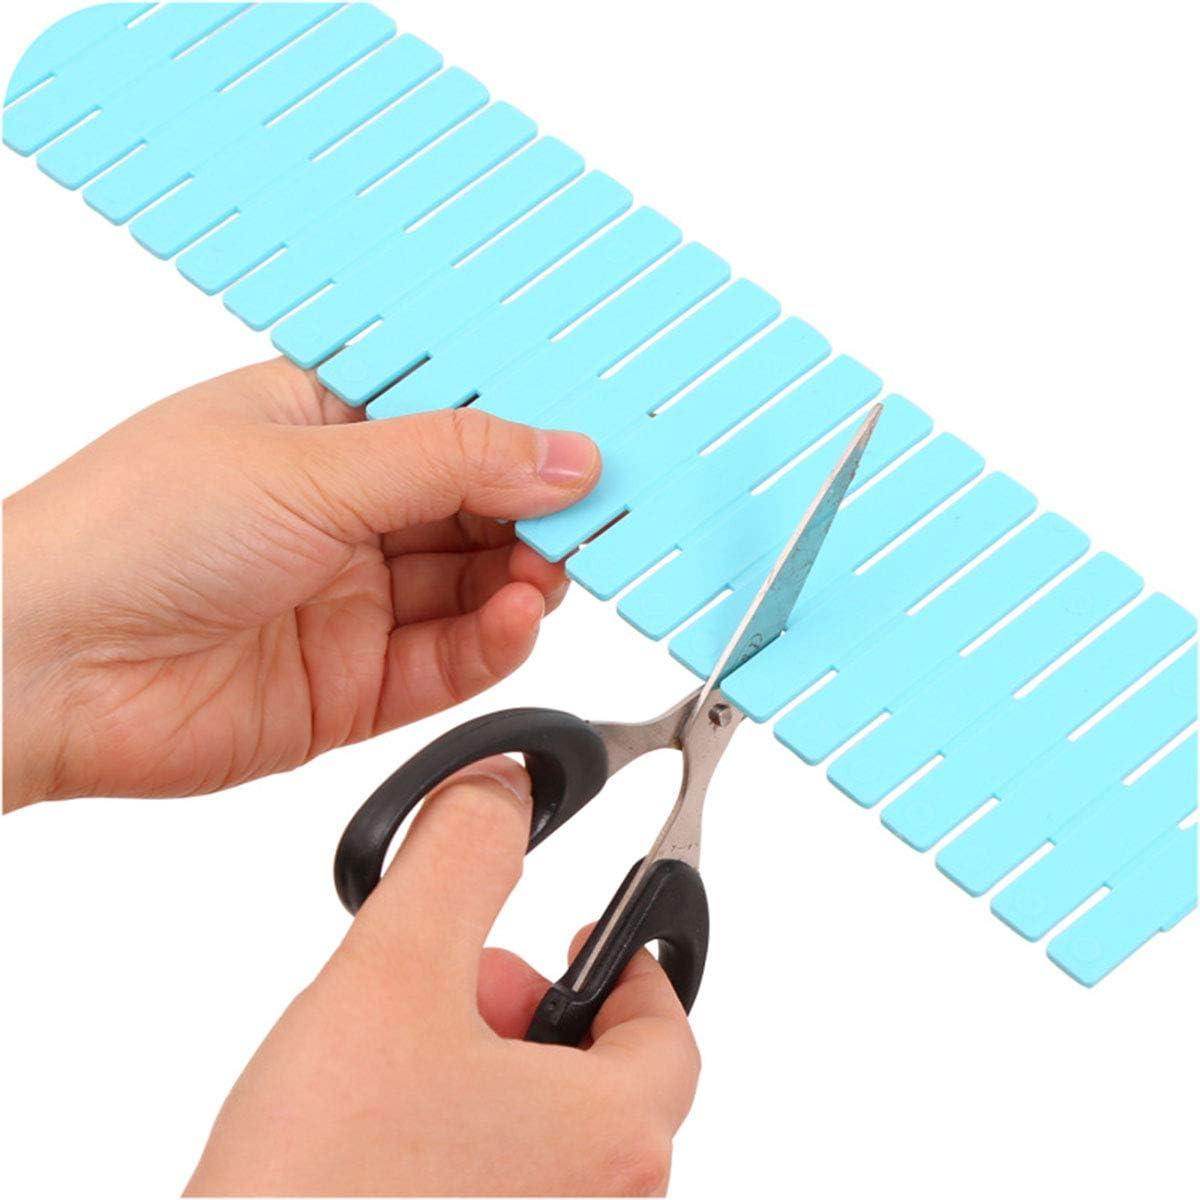 DERCLIVE 4Pcs Plastic Adjustable Drawer Dividers Drawer Make Up Organizer Separators for Office School Supplies,Kitchen Tools